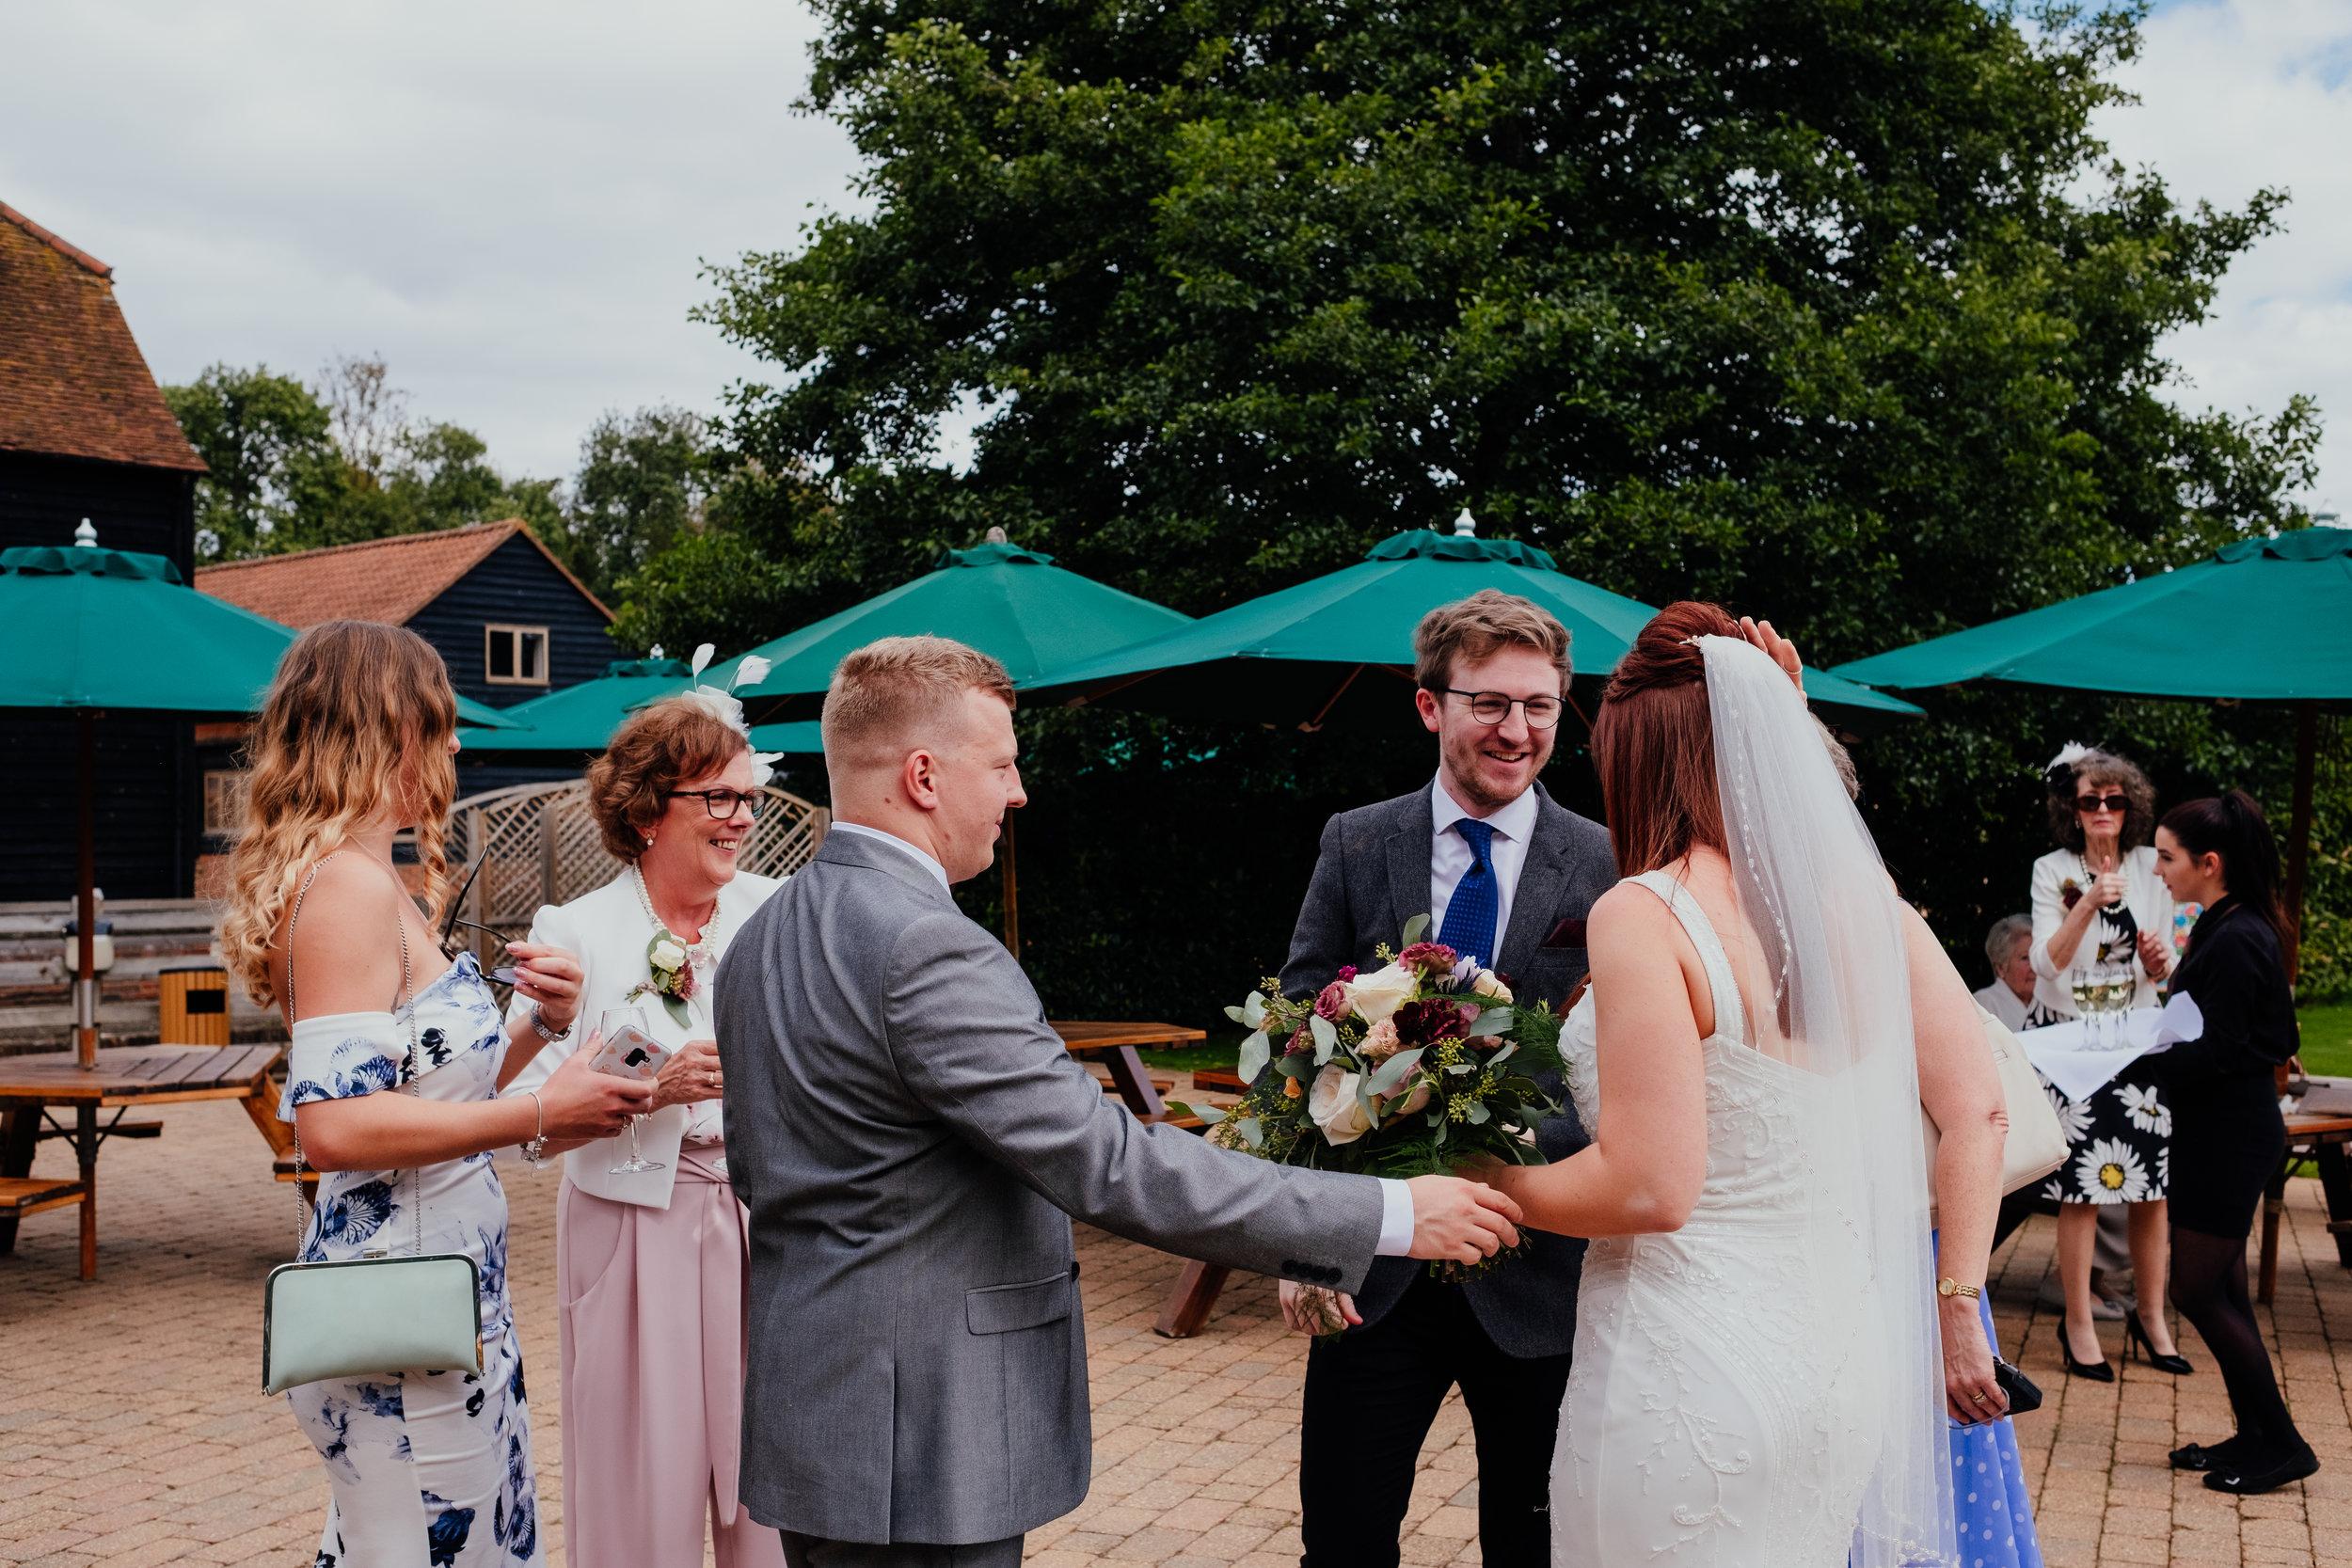 Wedding guests greet bride at wedding